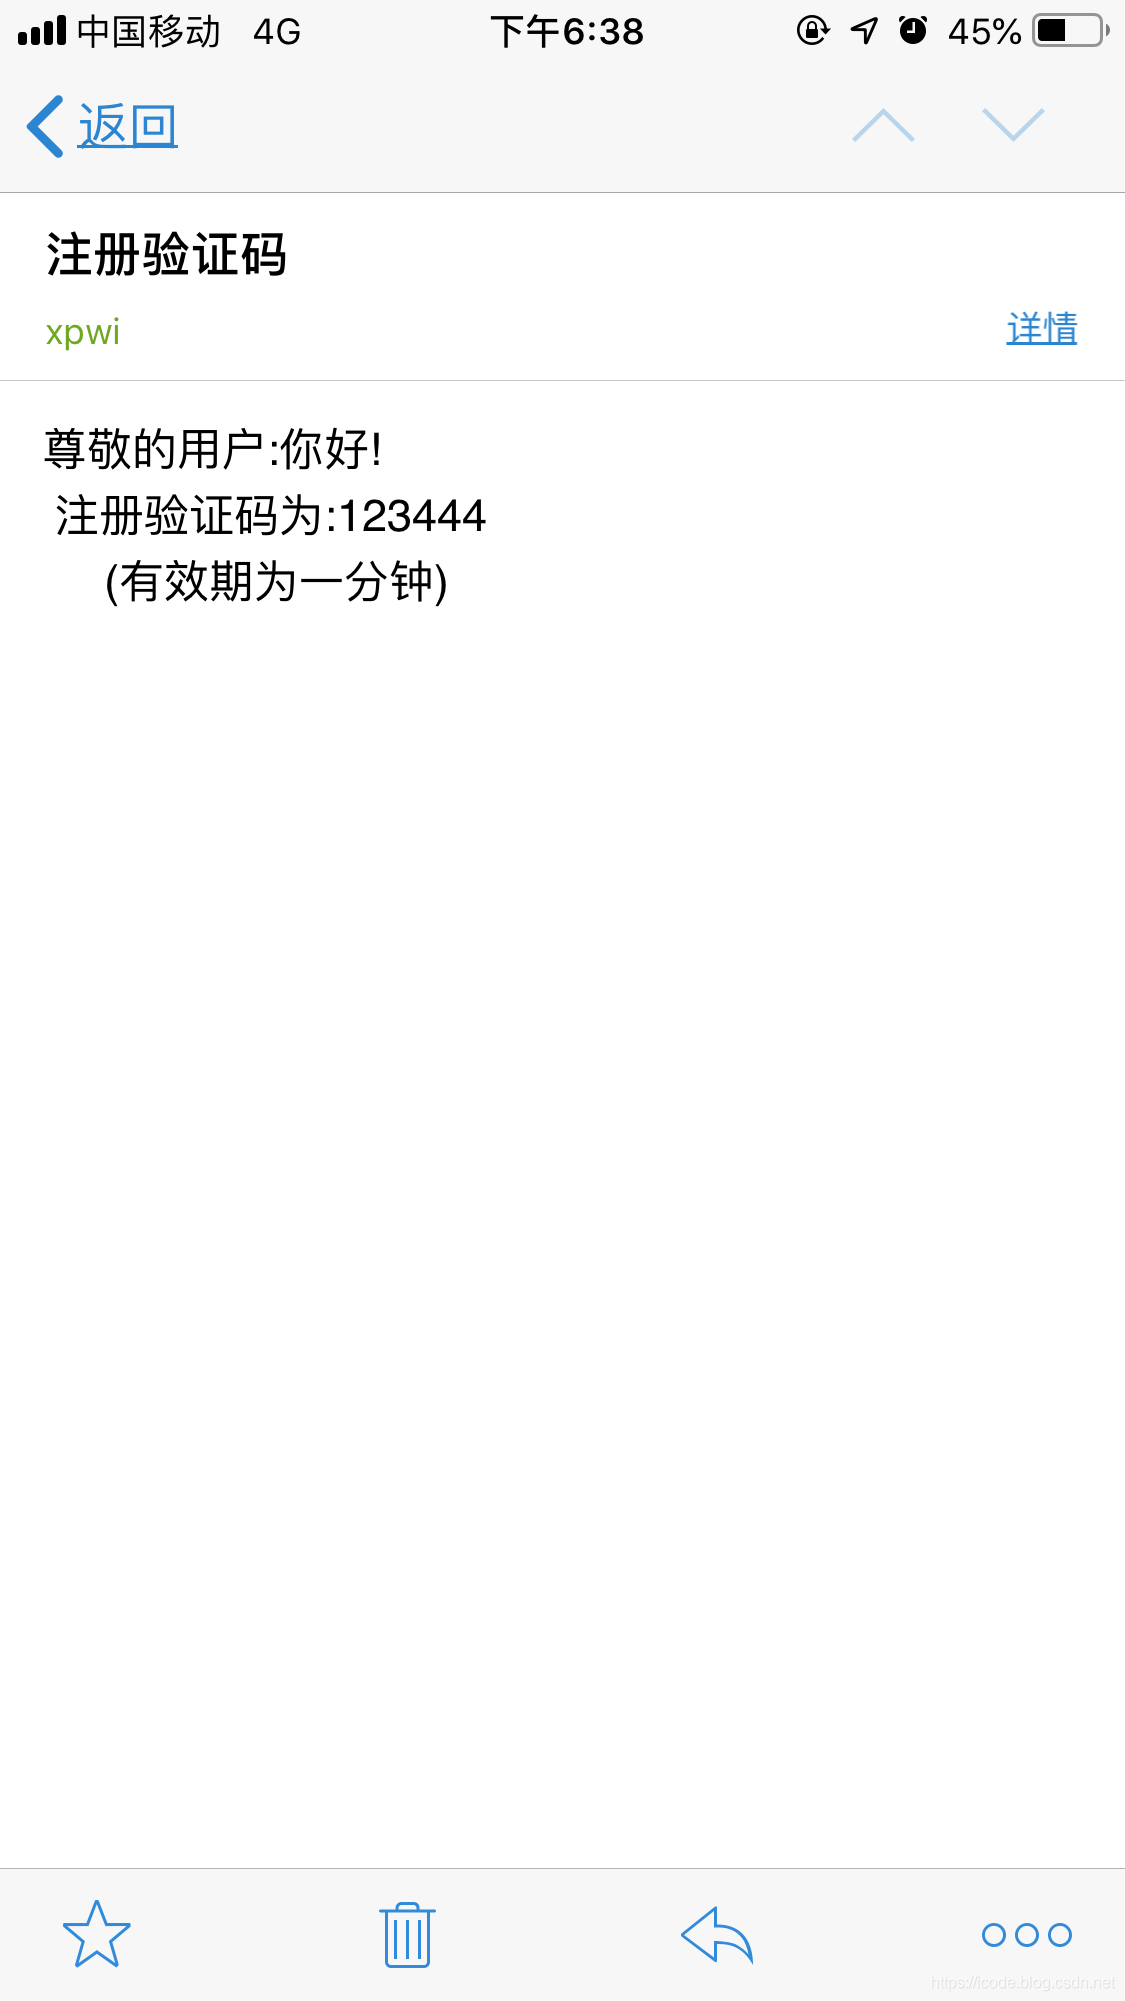 7b904876e7135693596fcf09243d4cce.png